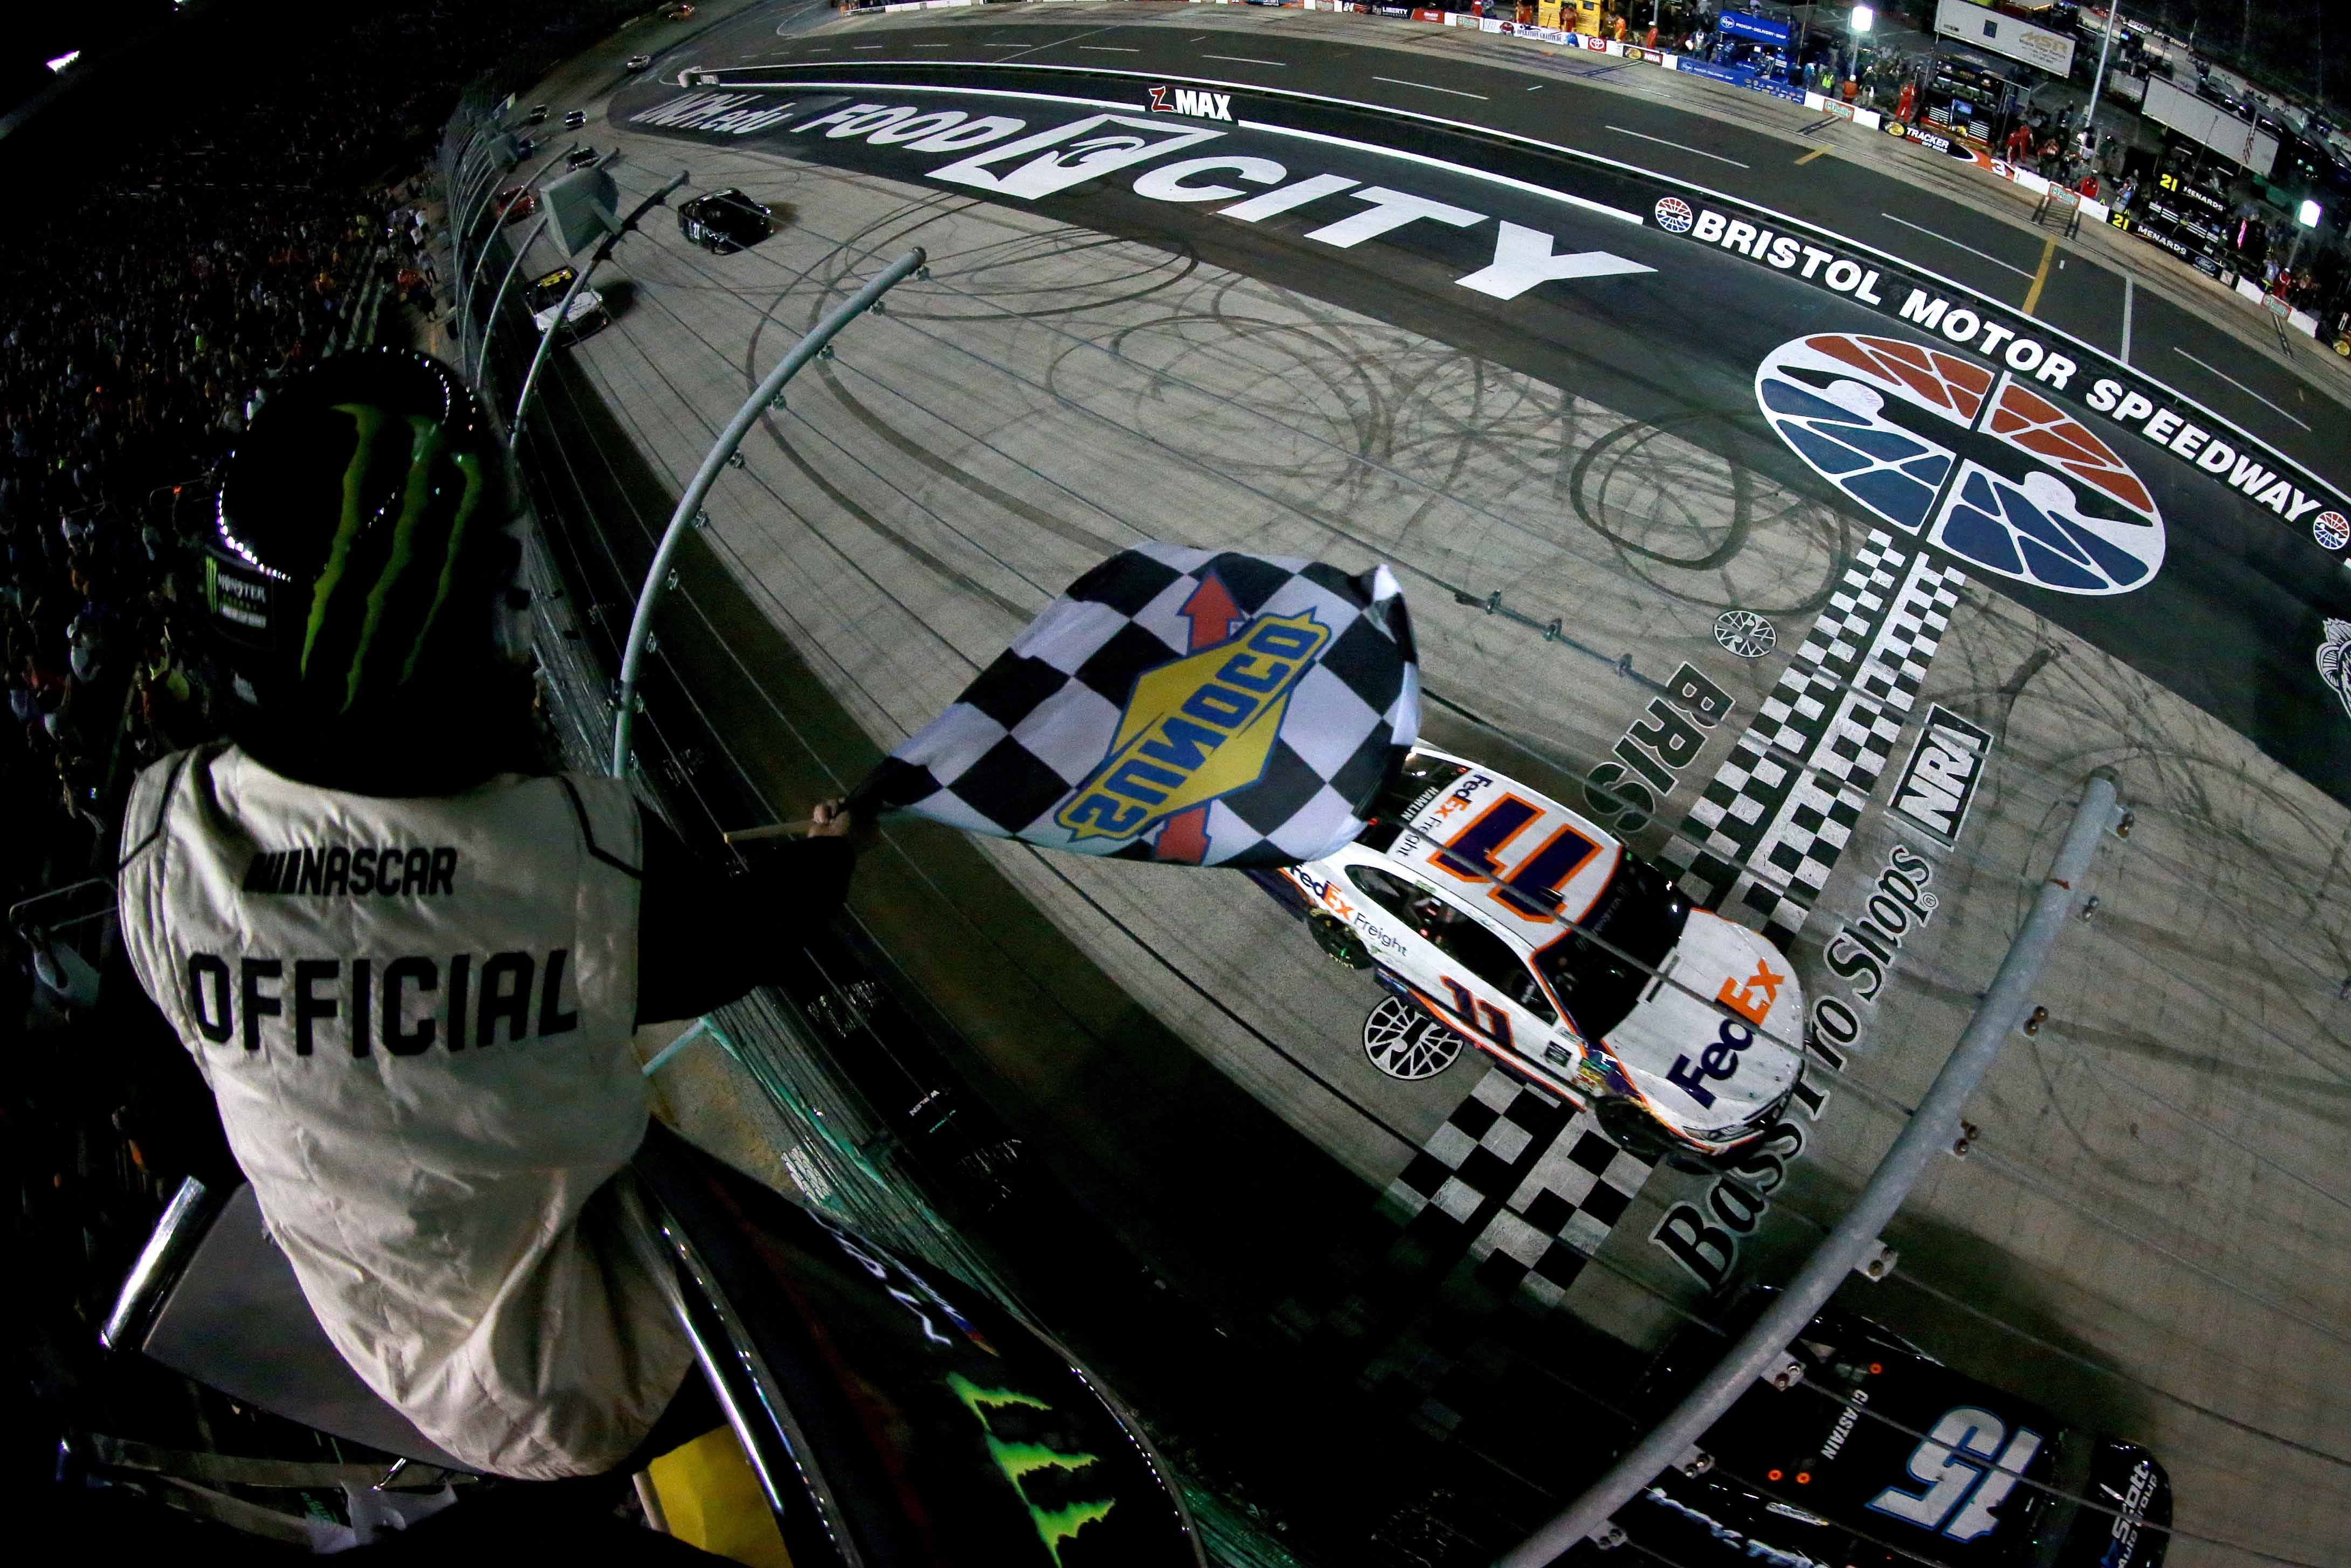 Denny Hamlins wins at Bristol Motor Speedway - NASCAR Cup Series